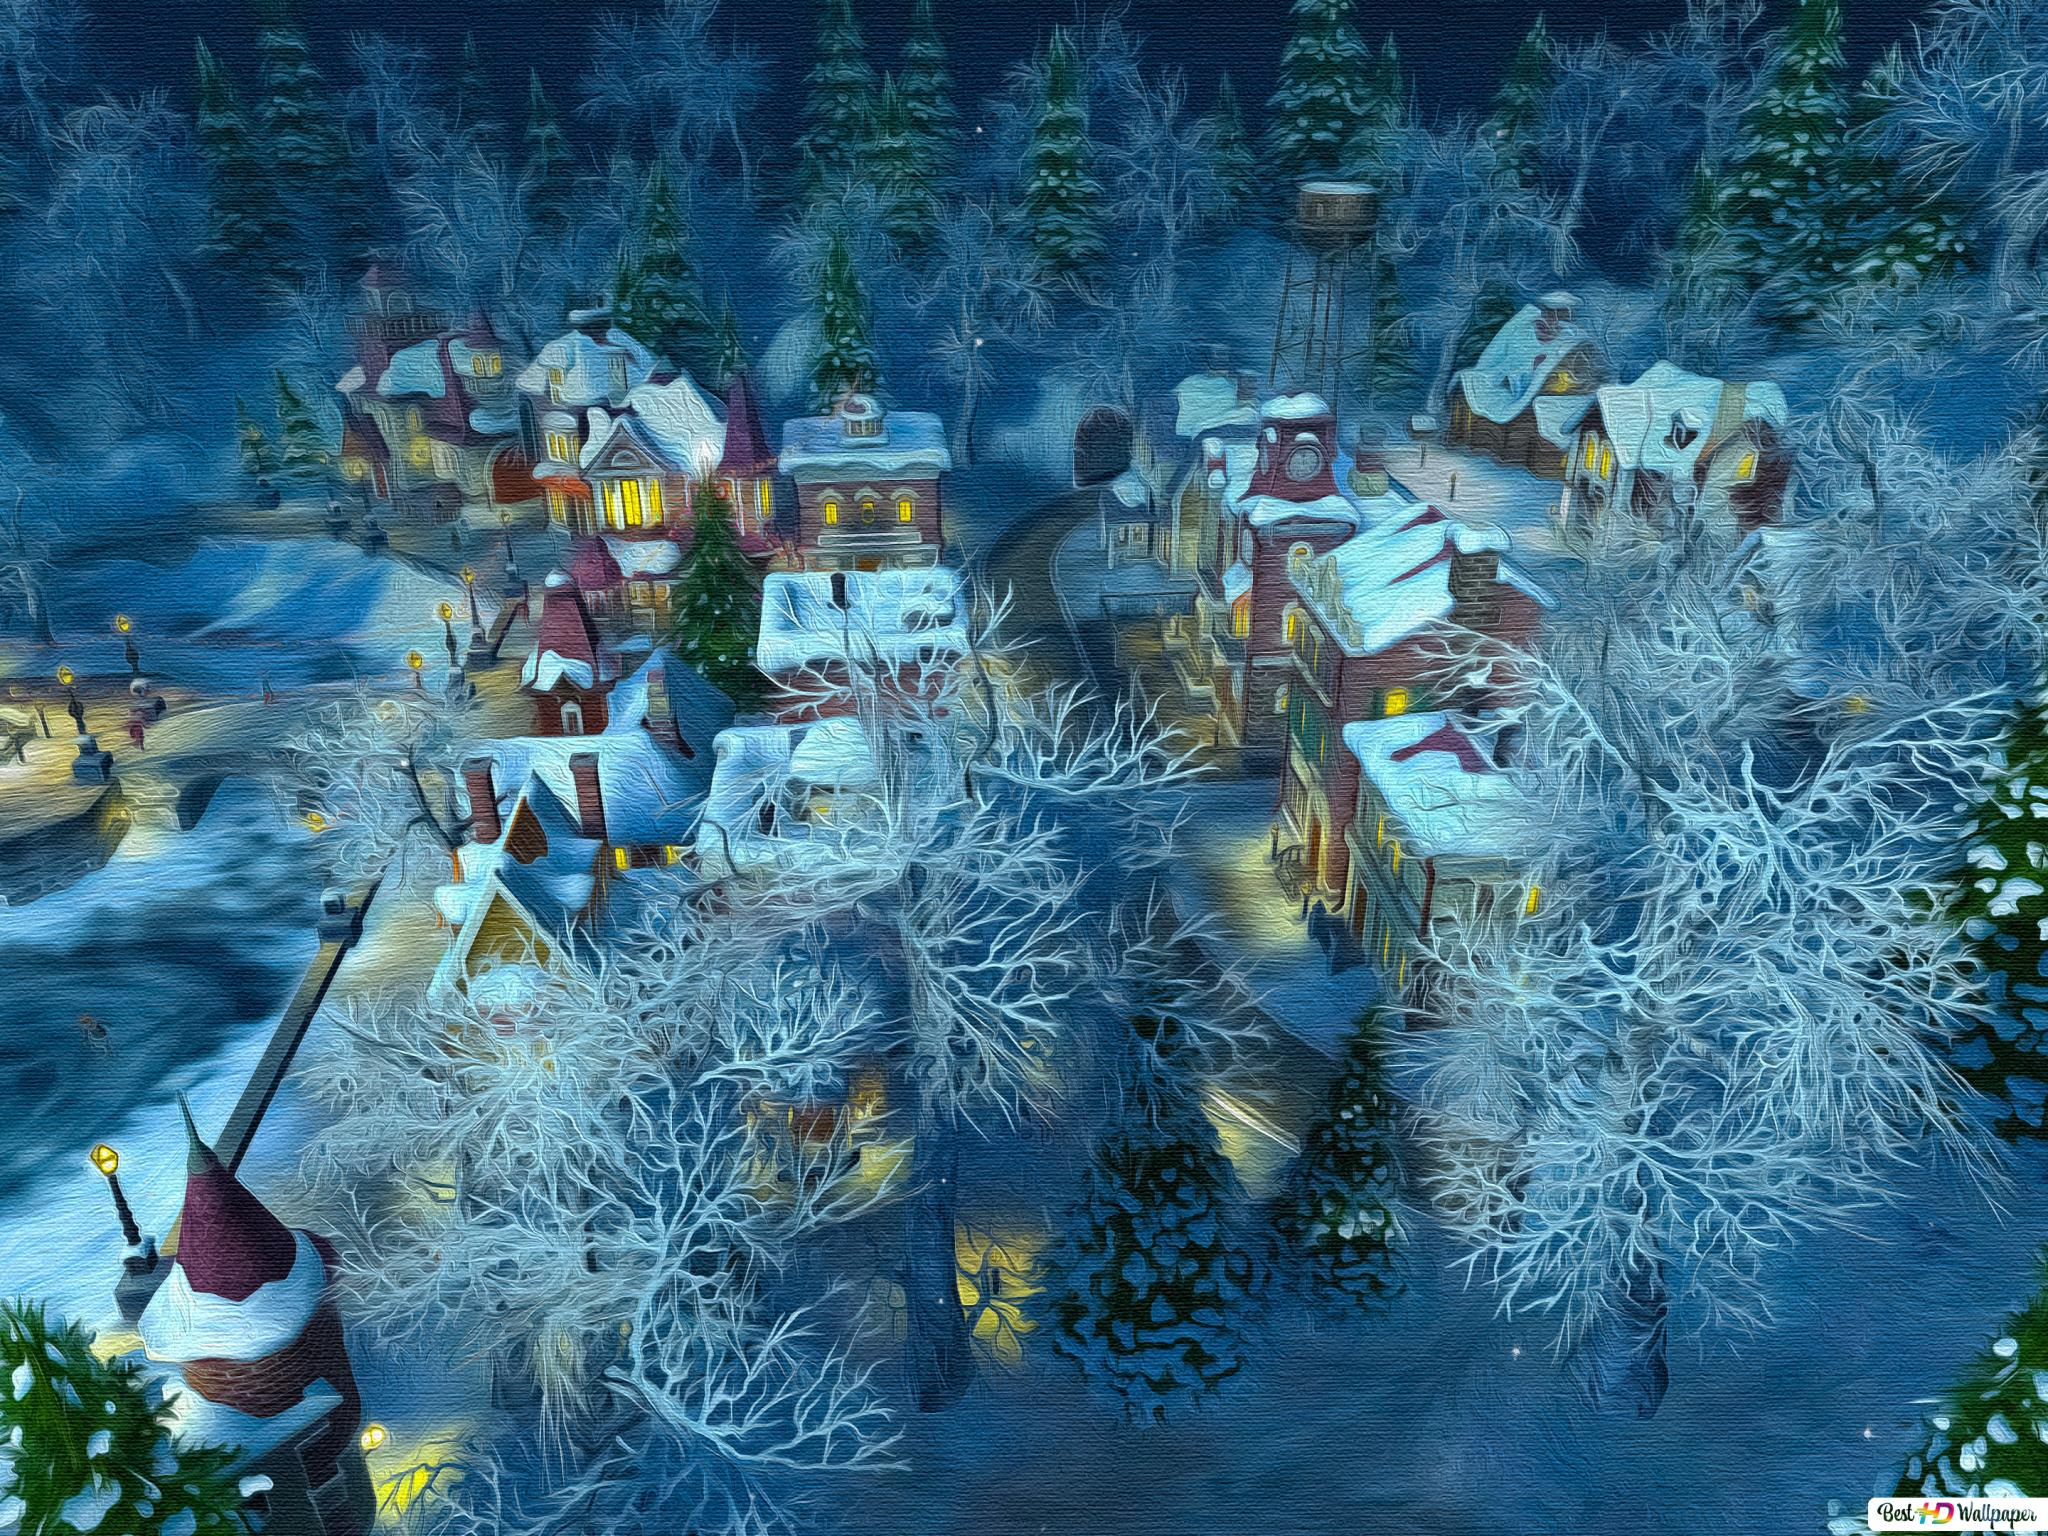 Kar Köy Boyama Hd Duvar Kağıdı Indir